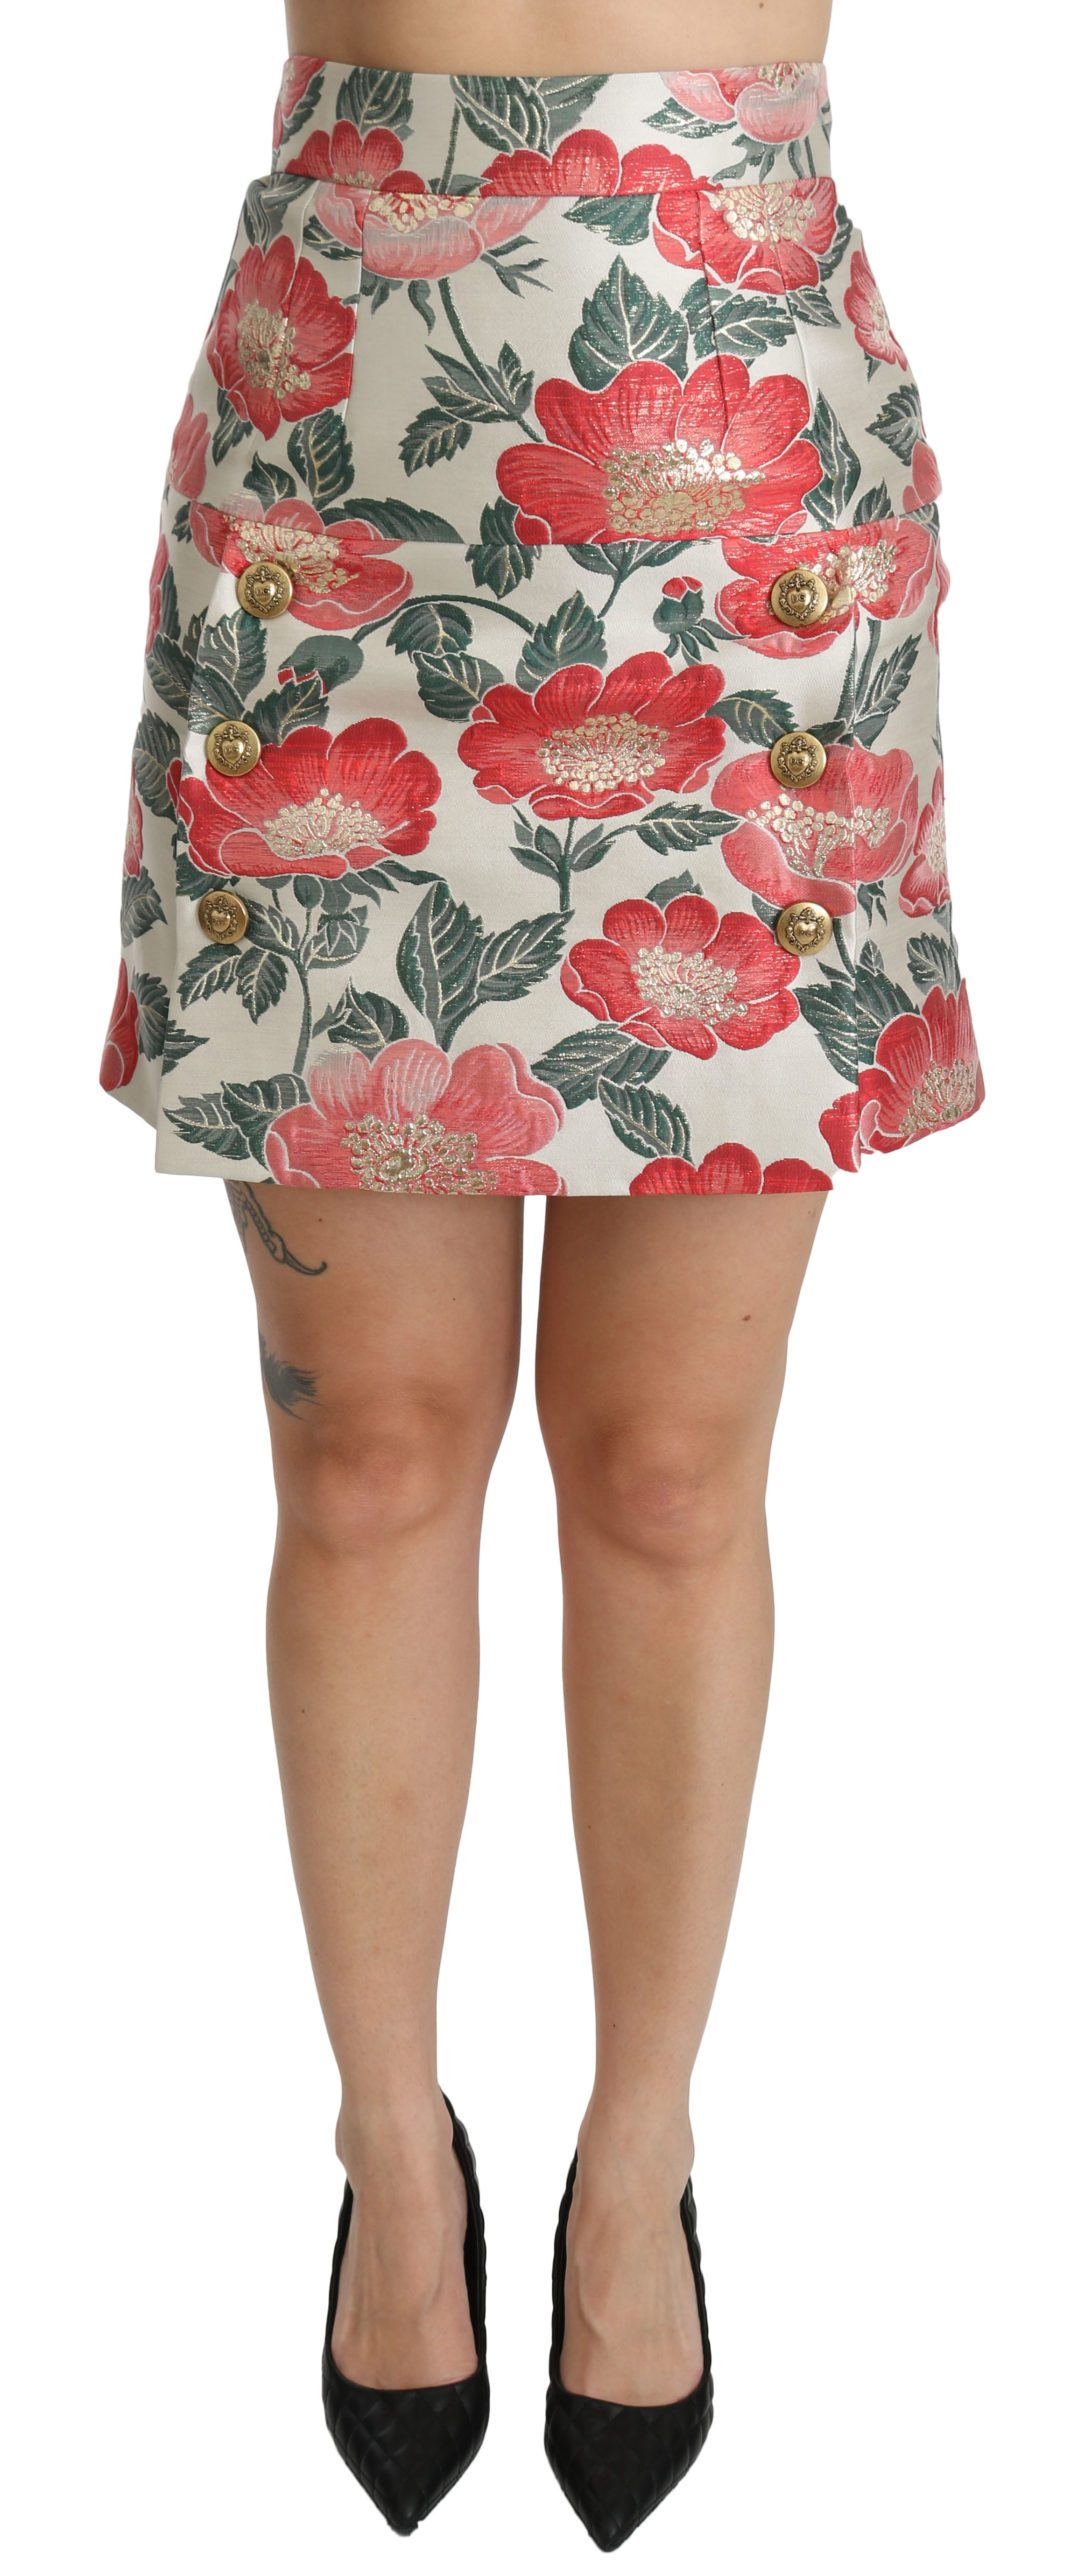 Dolce & Gabbana Women's Floral High Waist Mini Skirt White SKI1064 - IT36 | XS